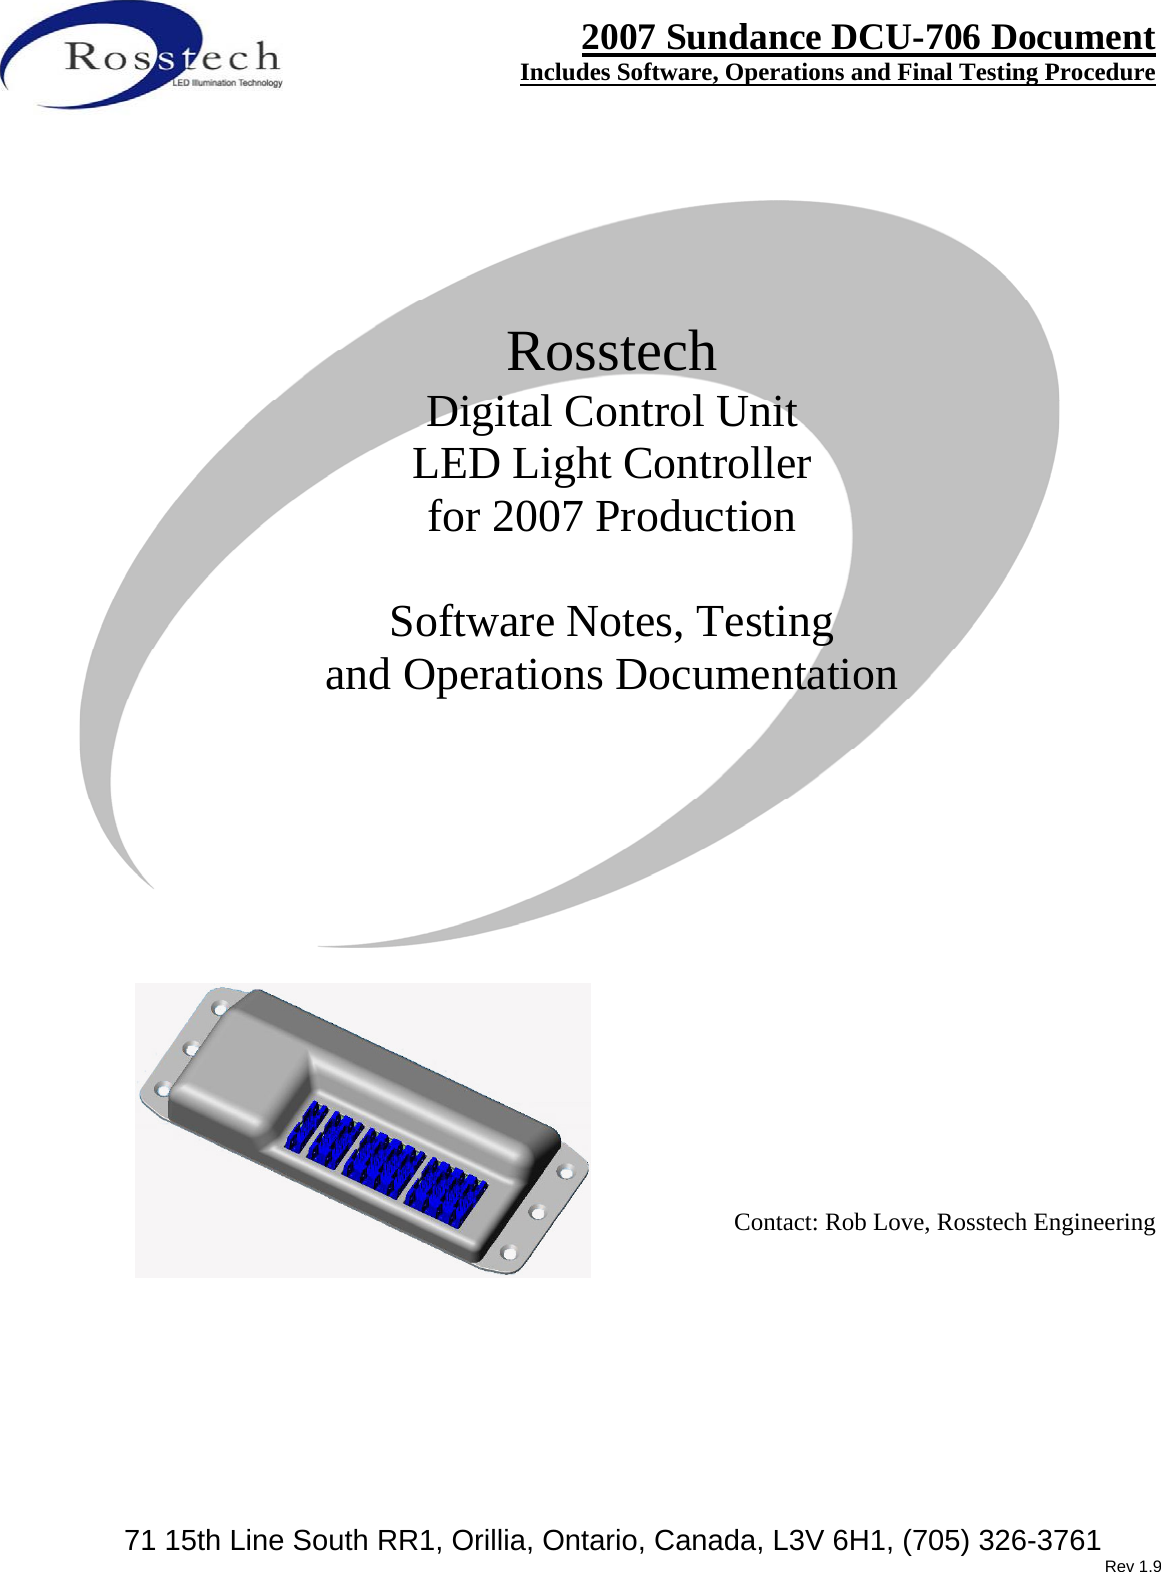 Rosstech Signals DCU706B DCU706B DIGITAL LED LIGHTING